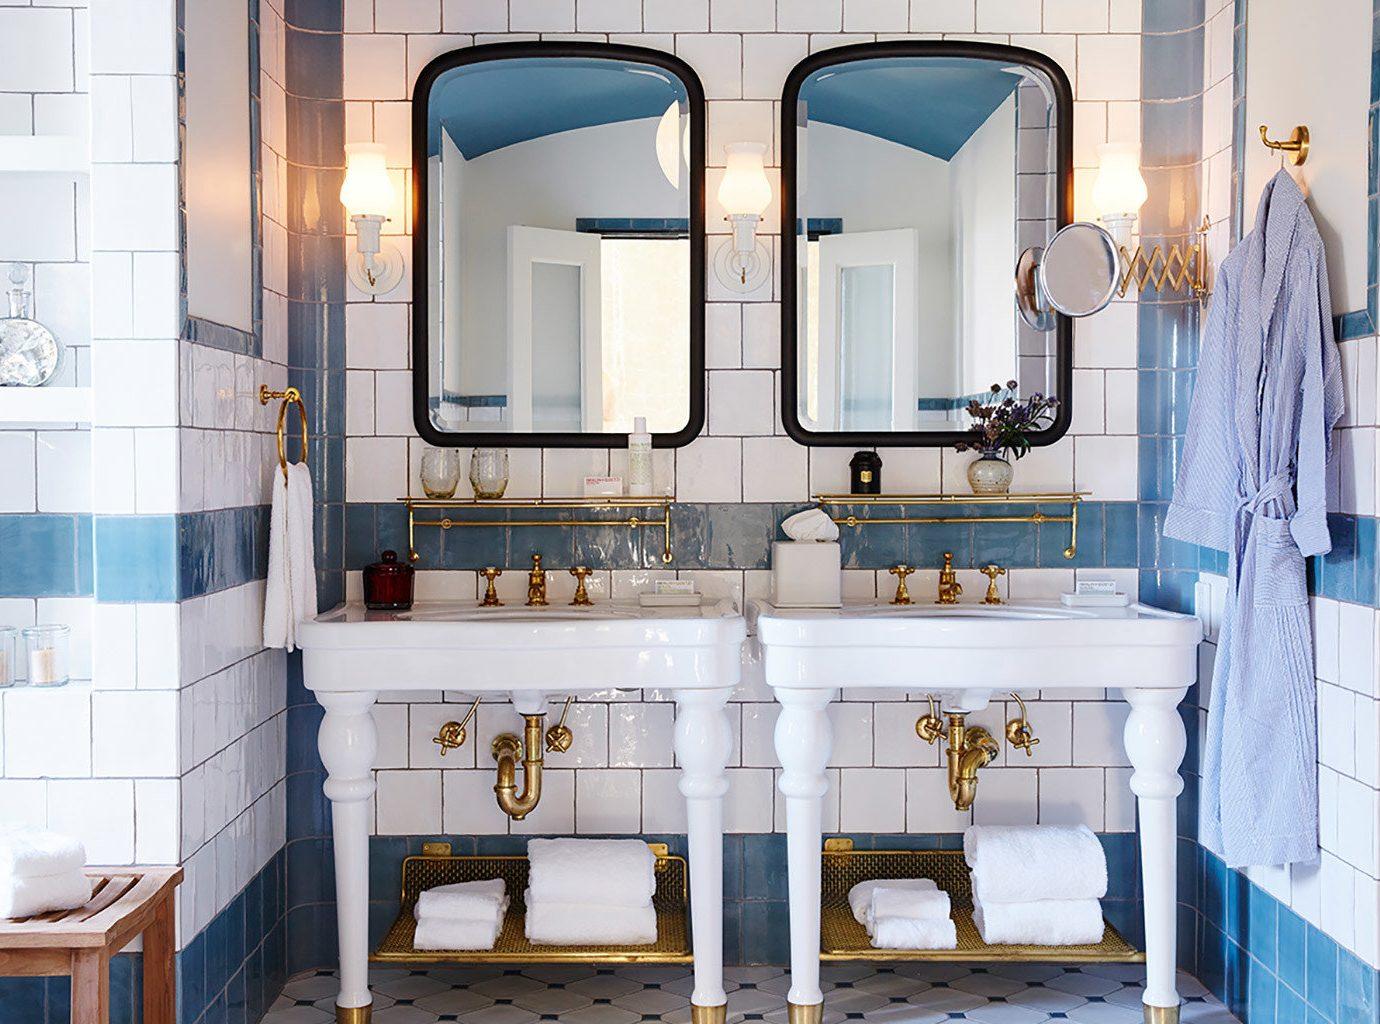 Trip Ideas indoor room bathroom property interior design home toilet plumbing fixture estate public toilet tile tiled